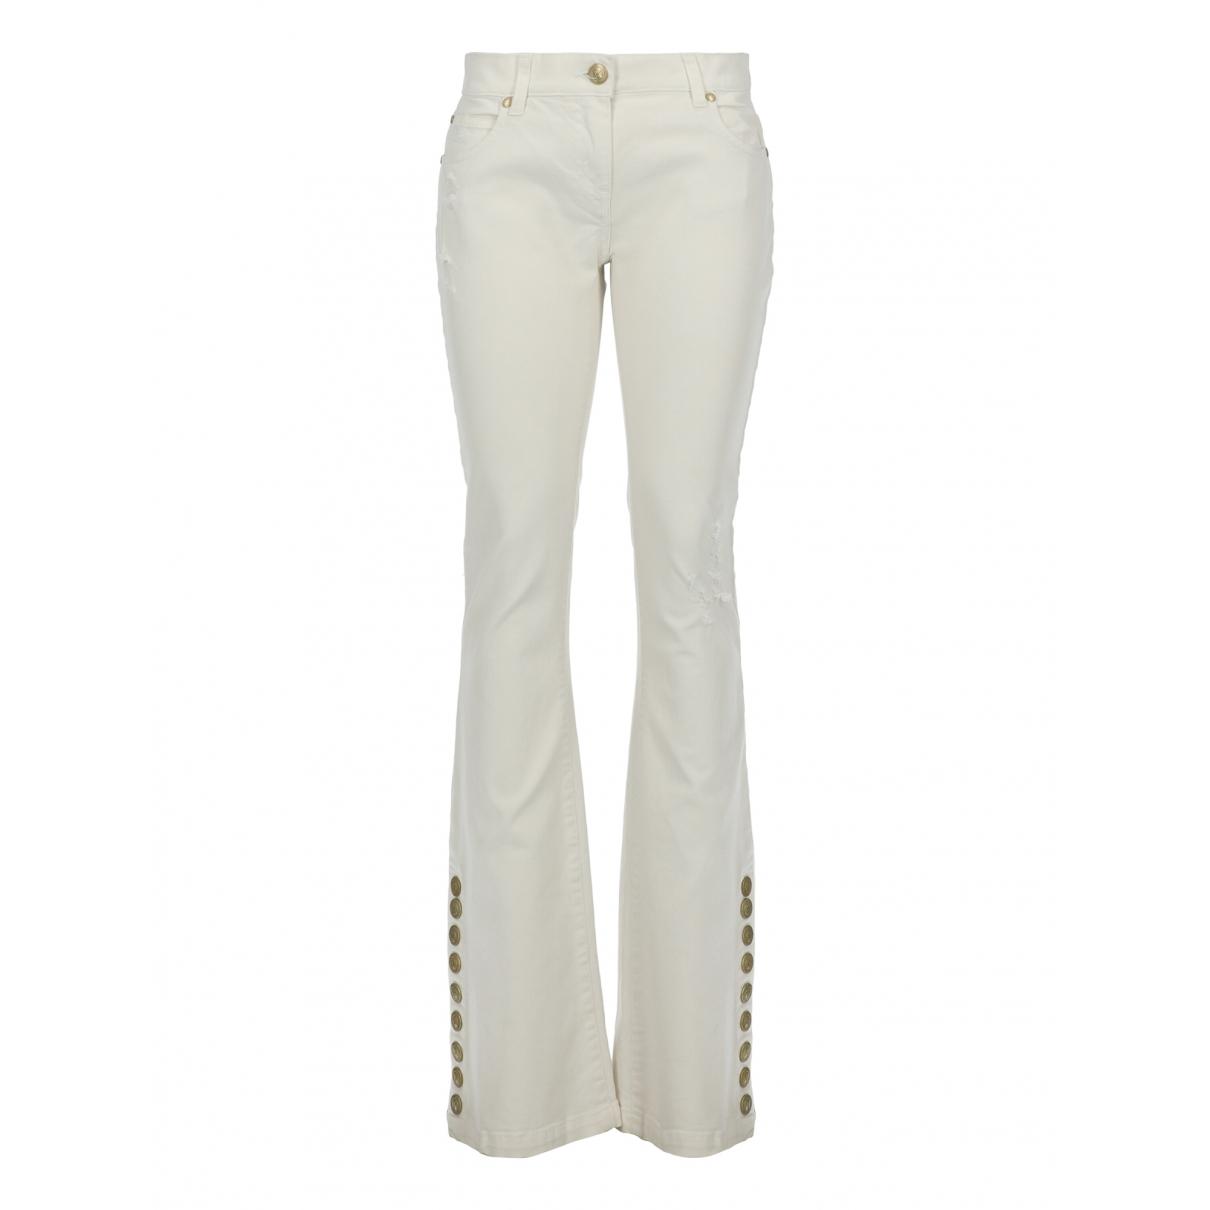 Balmain \N White Cotton Jeans for Women 27 US